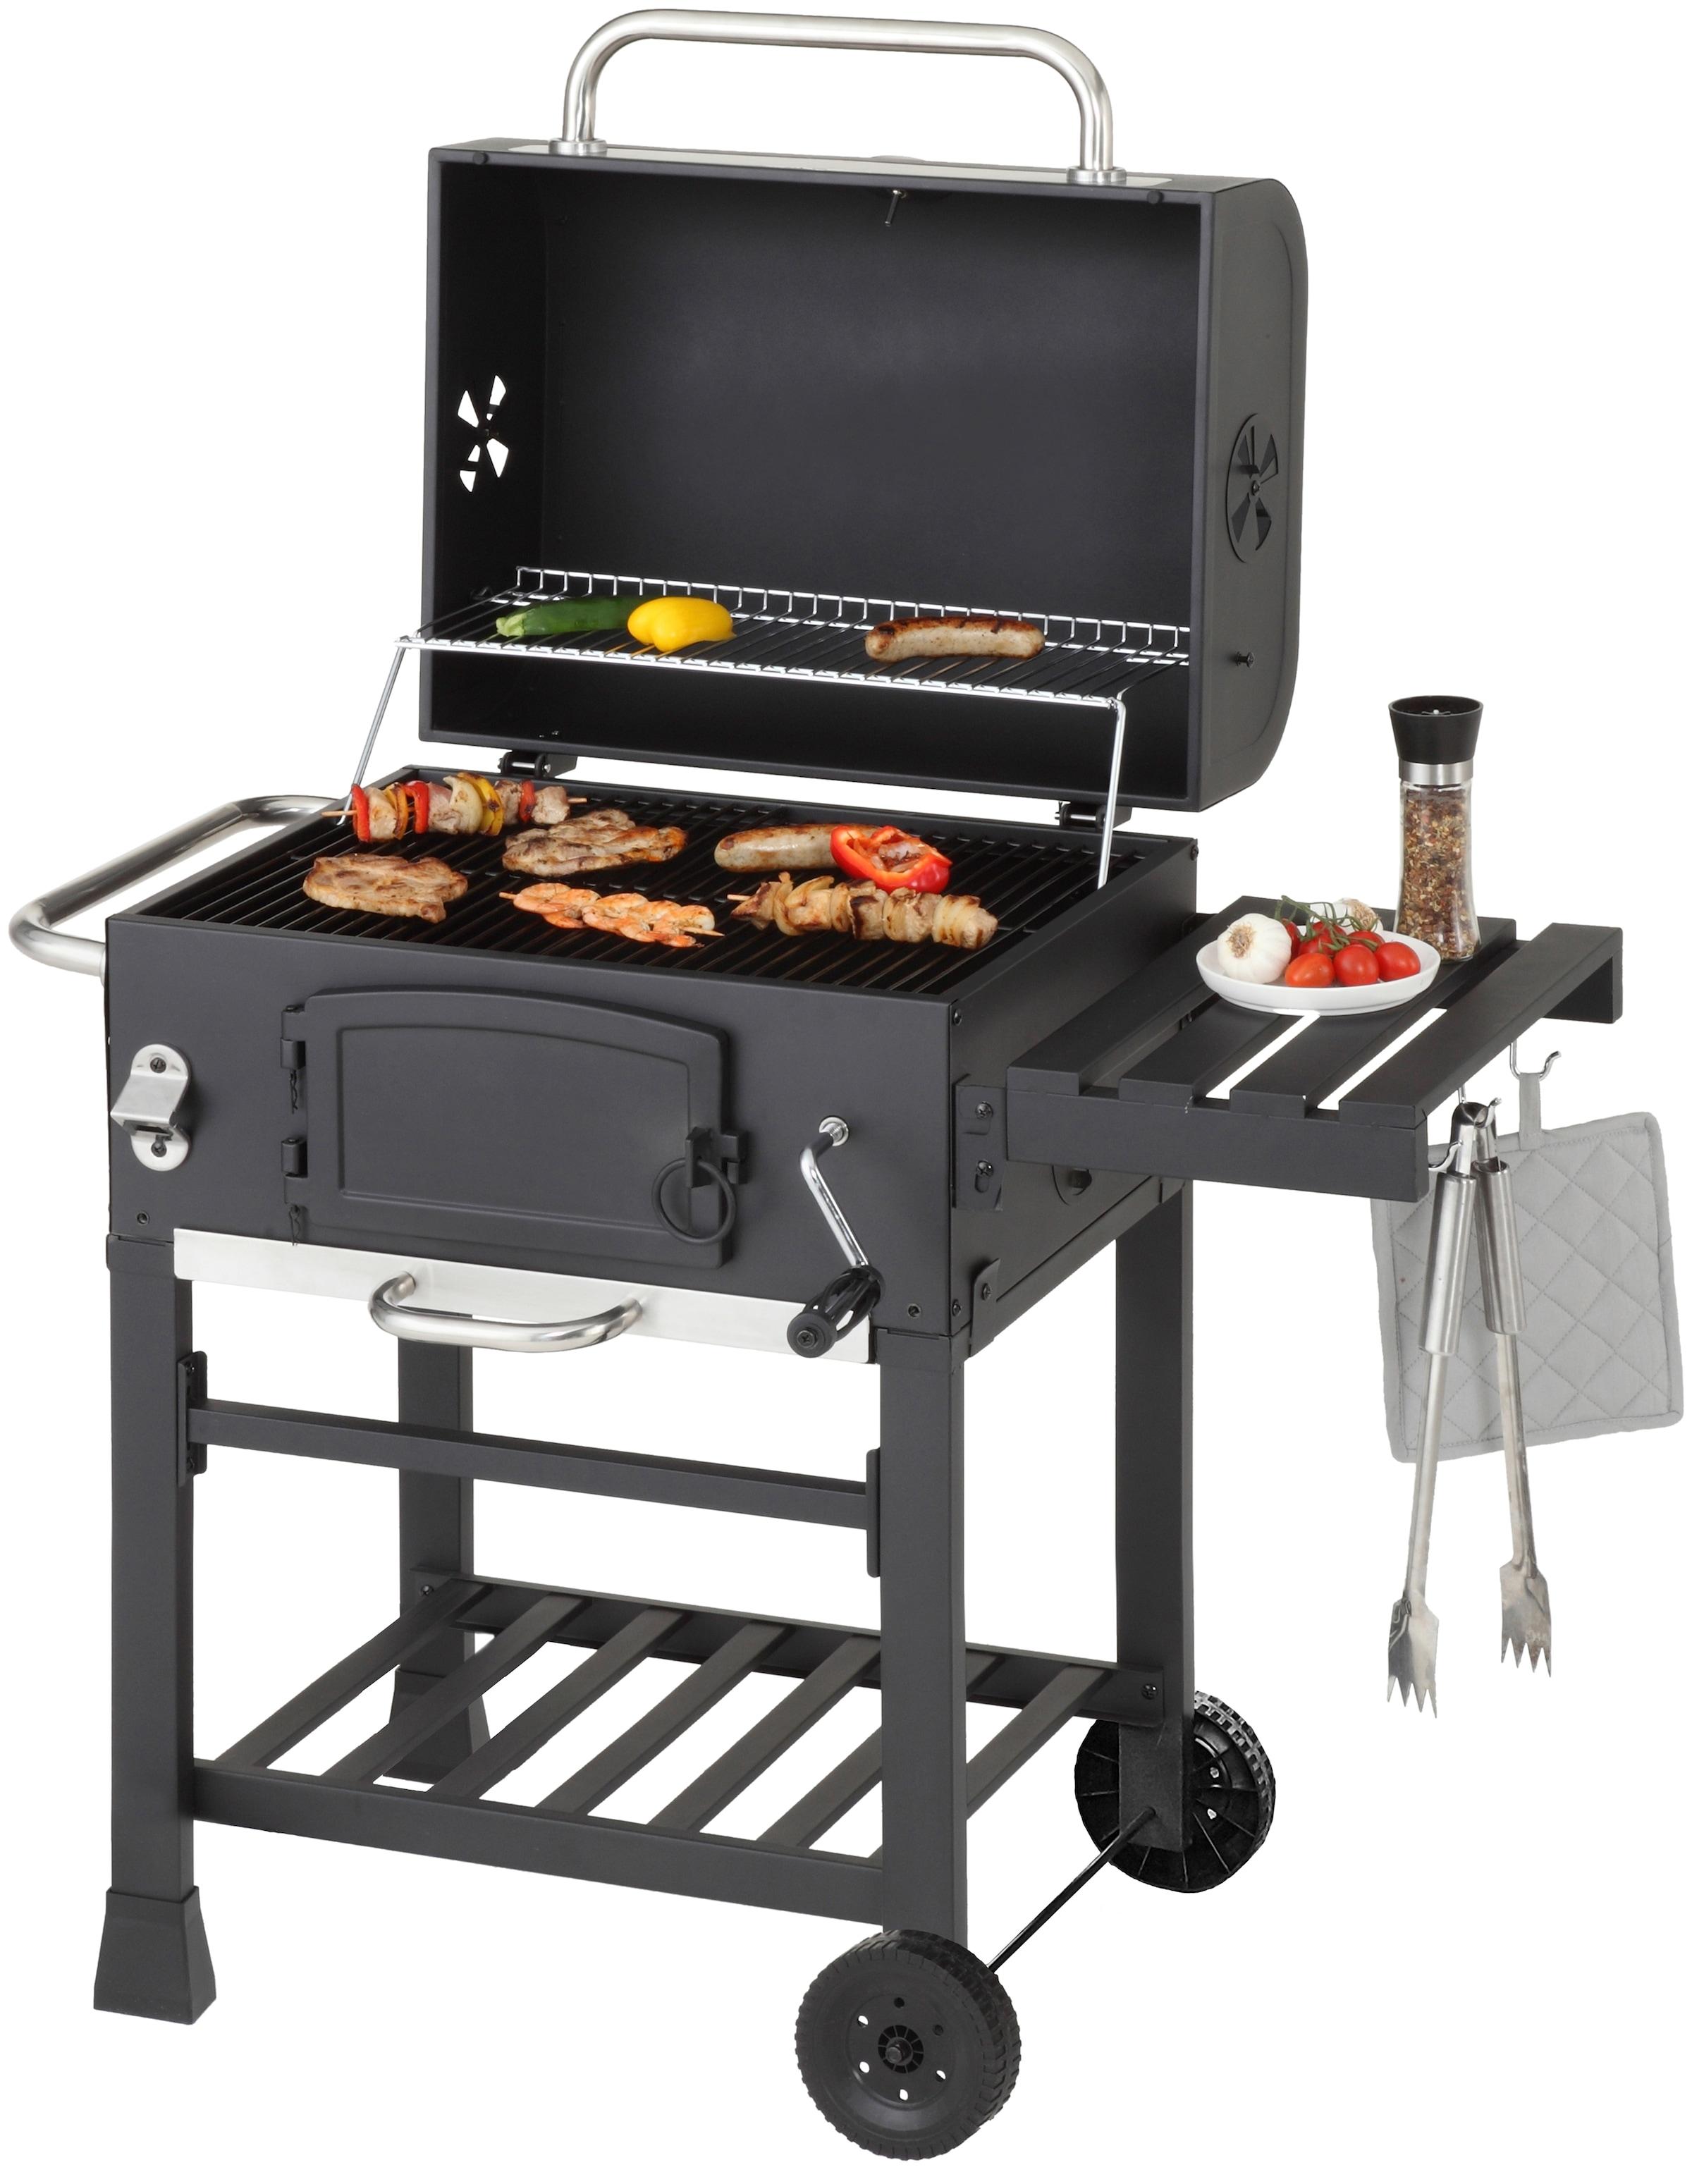 Weber Xxl Holzkohlegrill : Weber grill shop weber go anywhere gasgrill gasgrills grills grillen